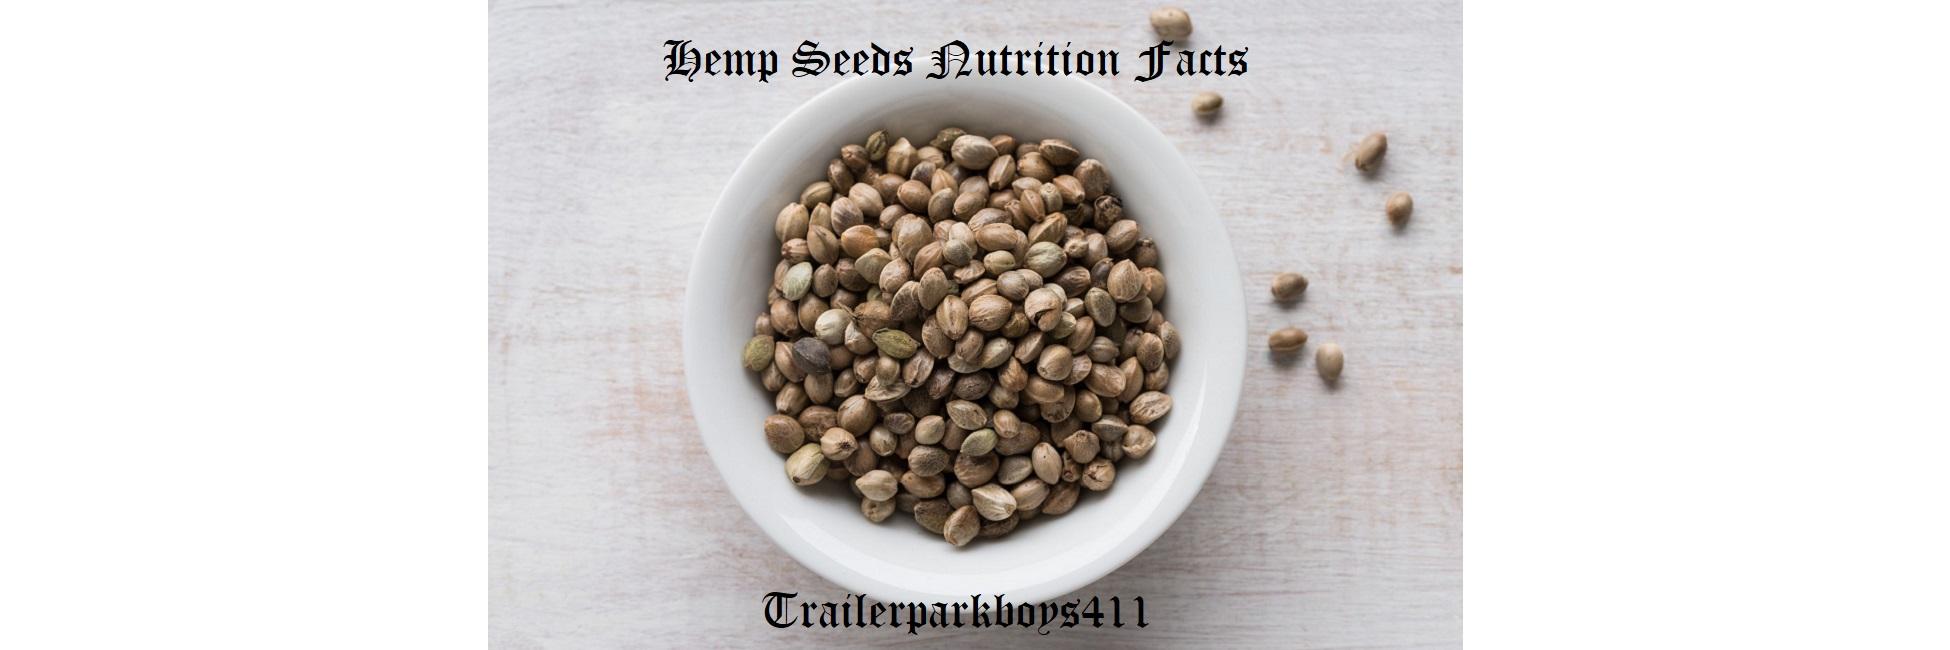 Hemp Seeds Nutrition Facts